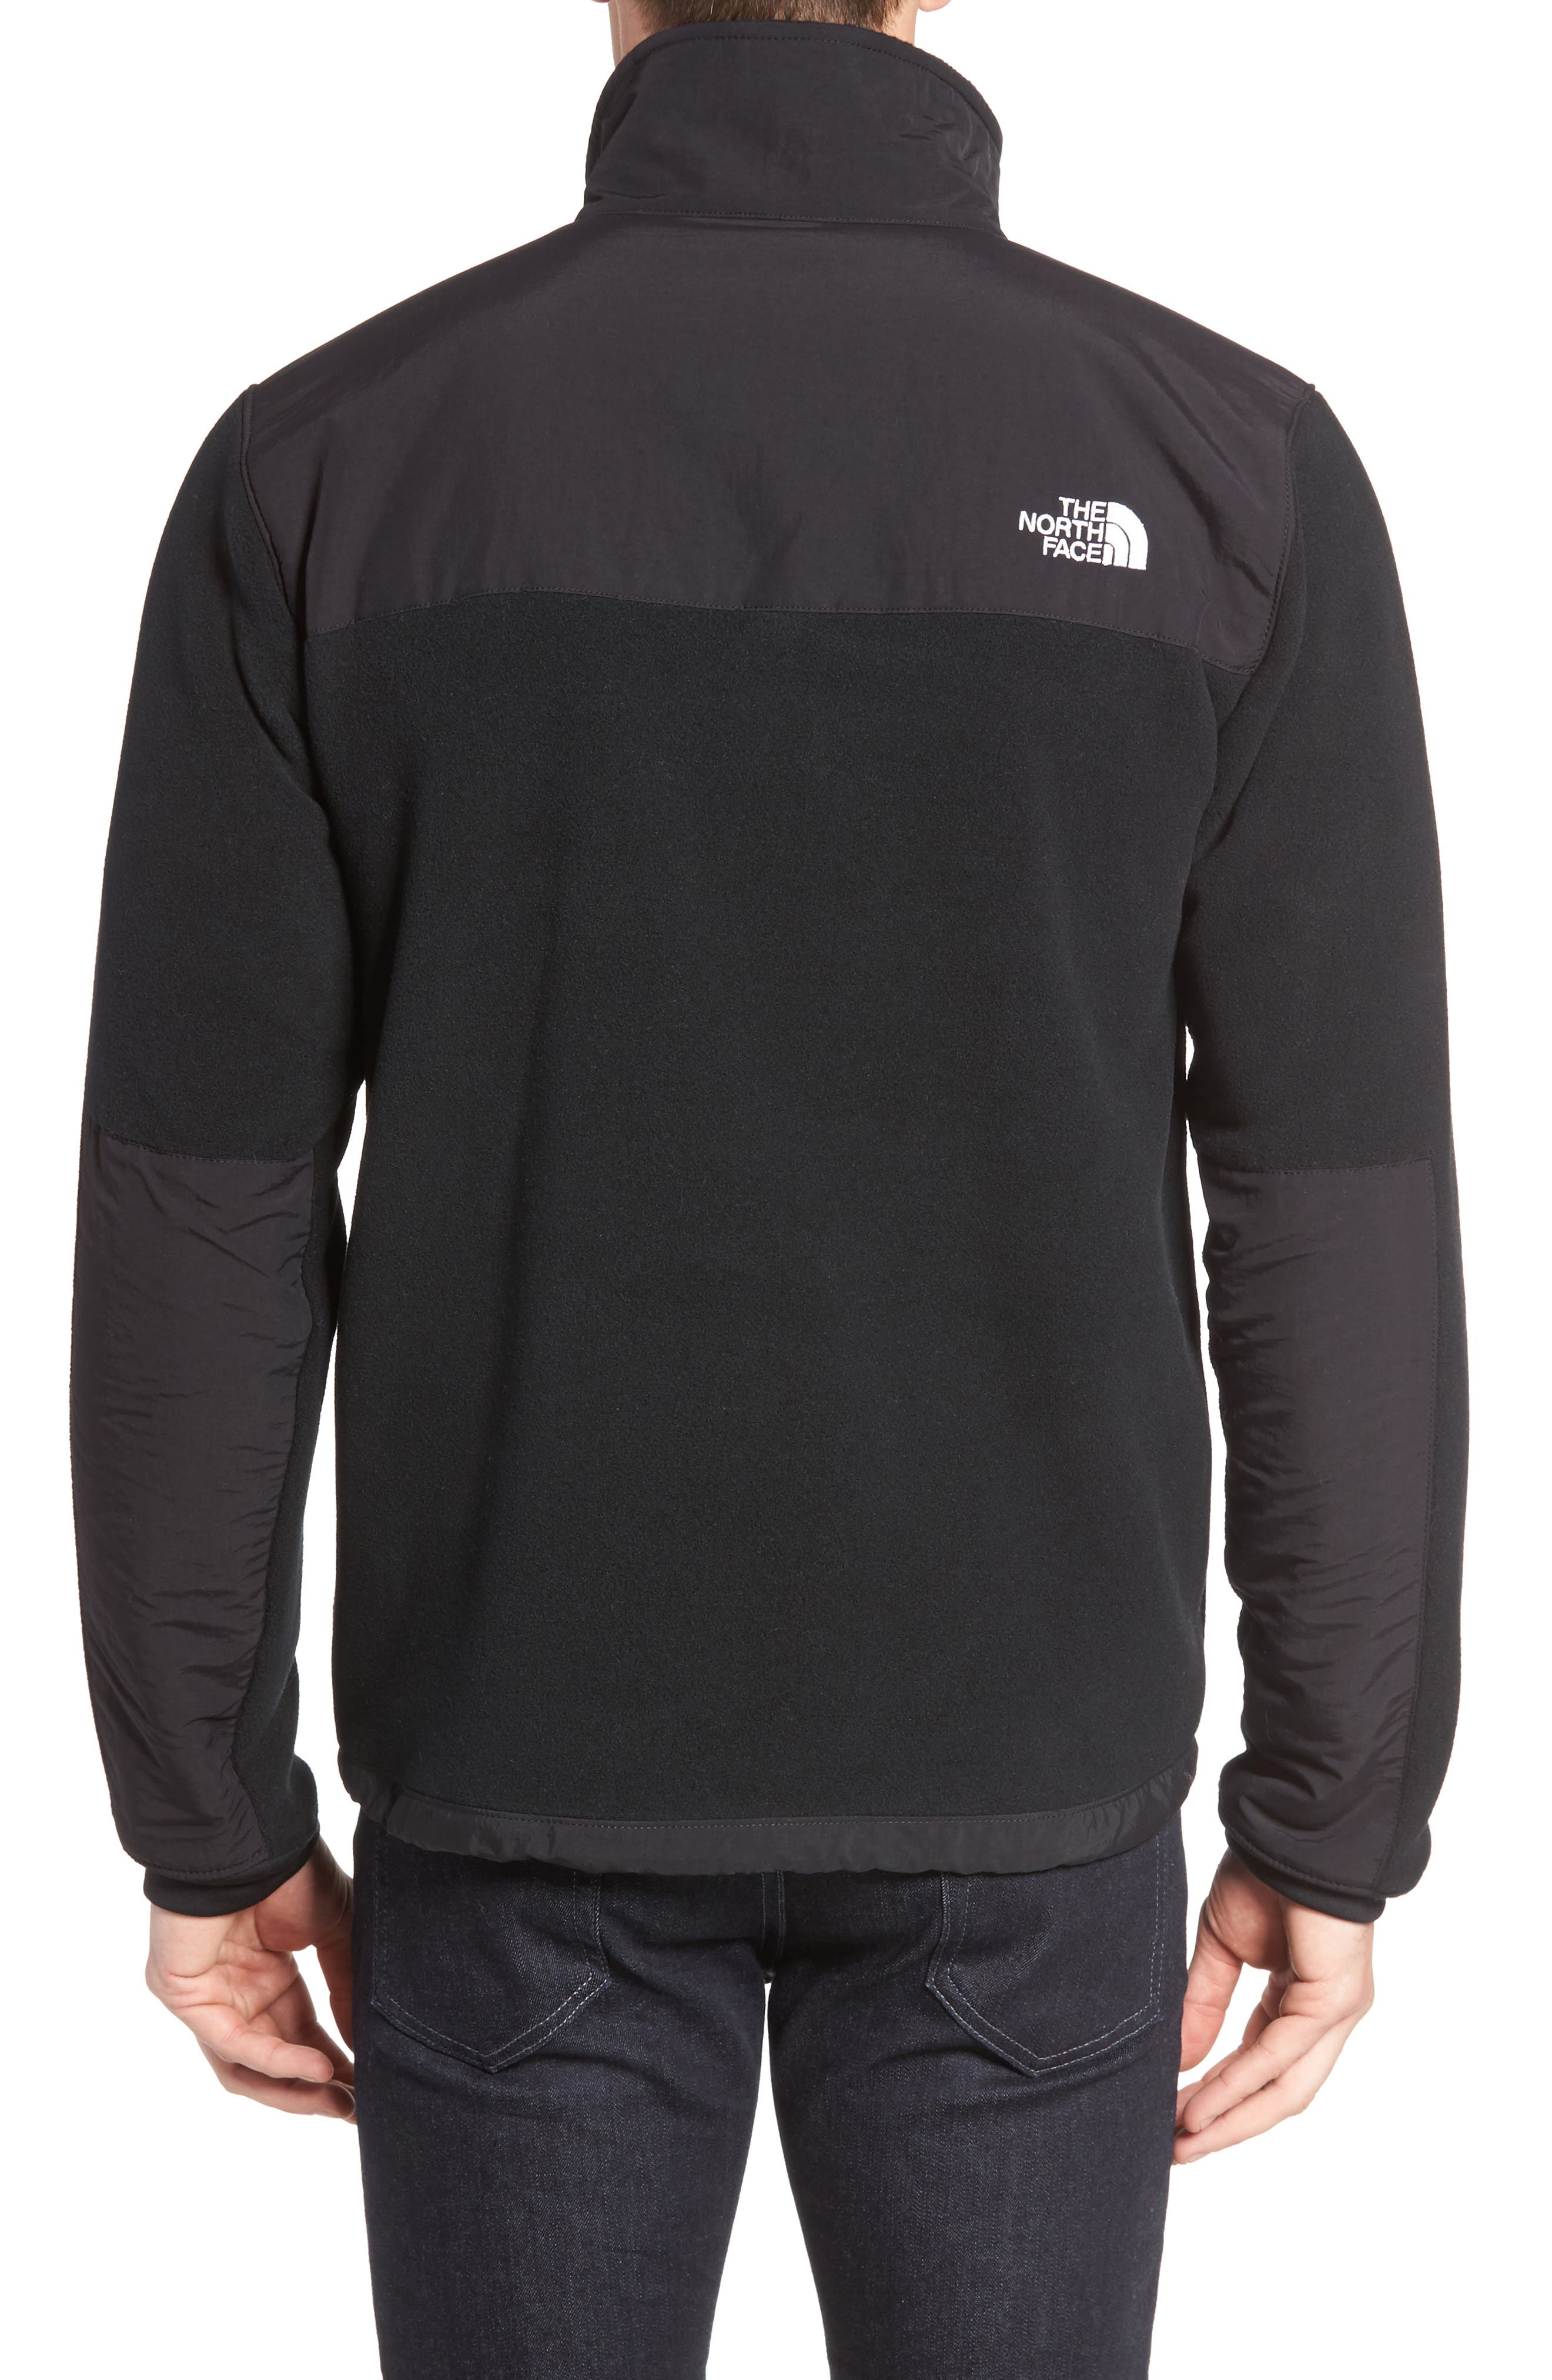 Denali 2 Recycled Fleece Jacket,                             Alternate thumbnail 3, color,                             001